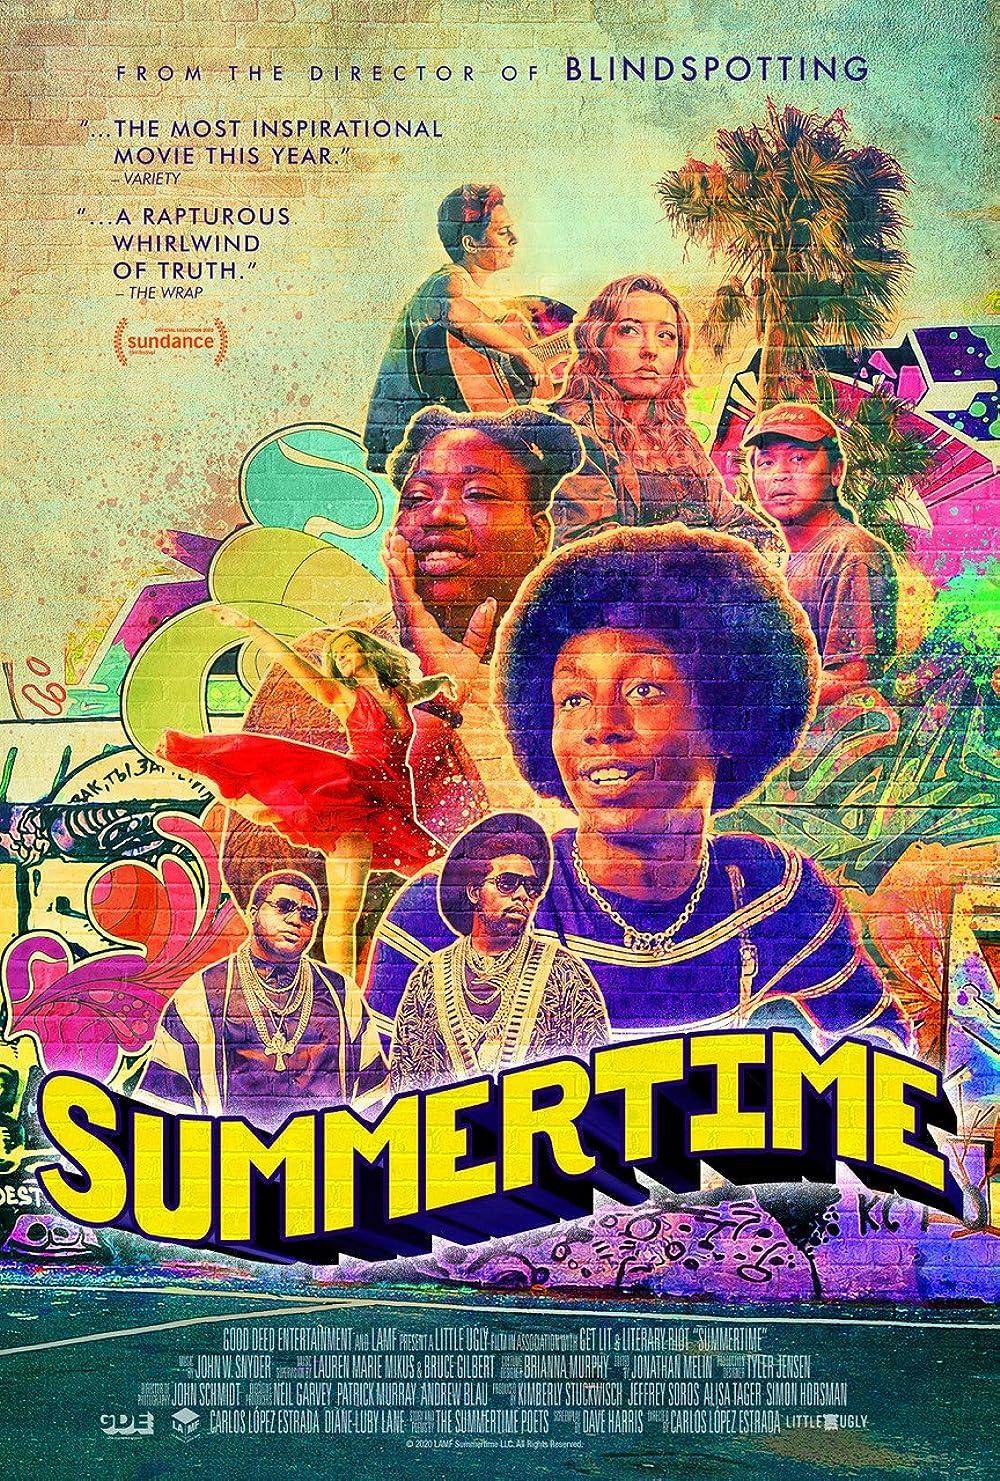 Download Summertime (2020) Full Movie [In English] With Hindi Subtitles   WebRip 720p [1XBET] FREE on 1XCinema.com & KatMovieHD.sk